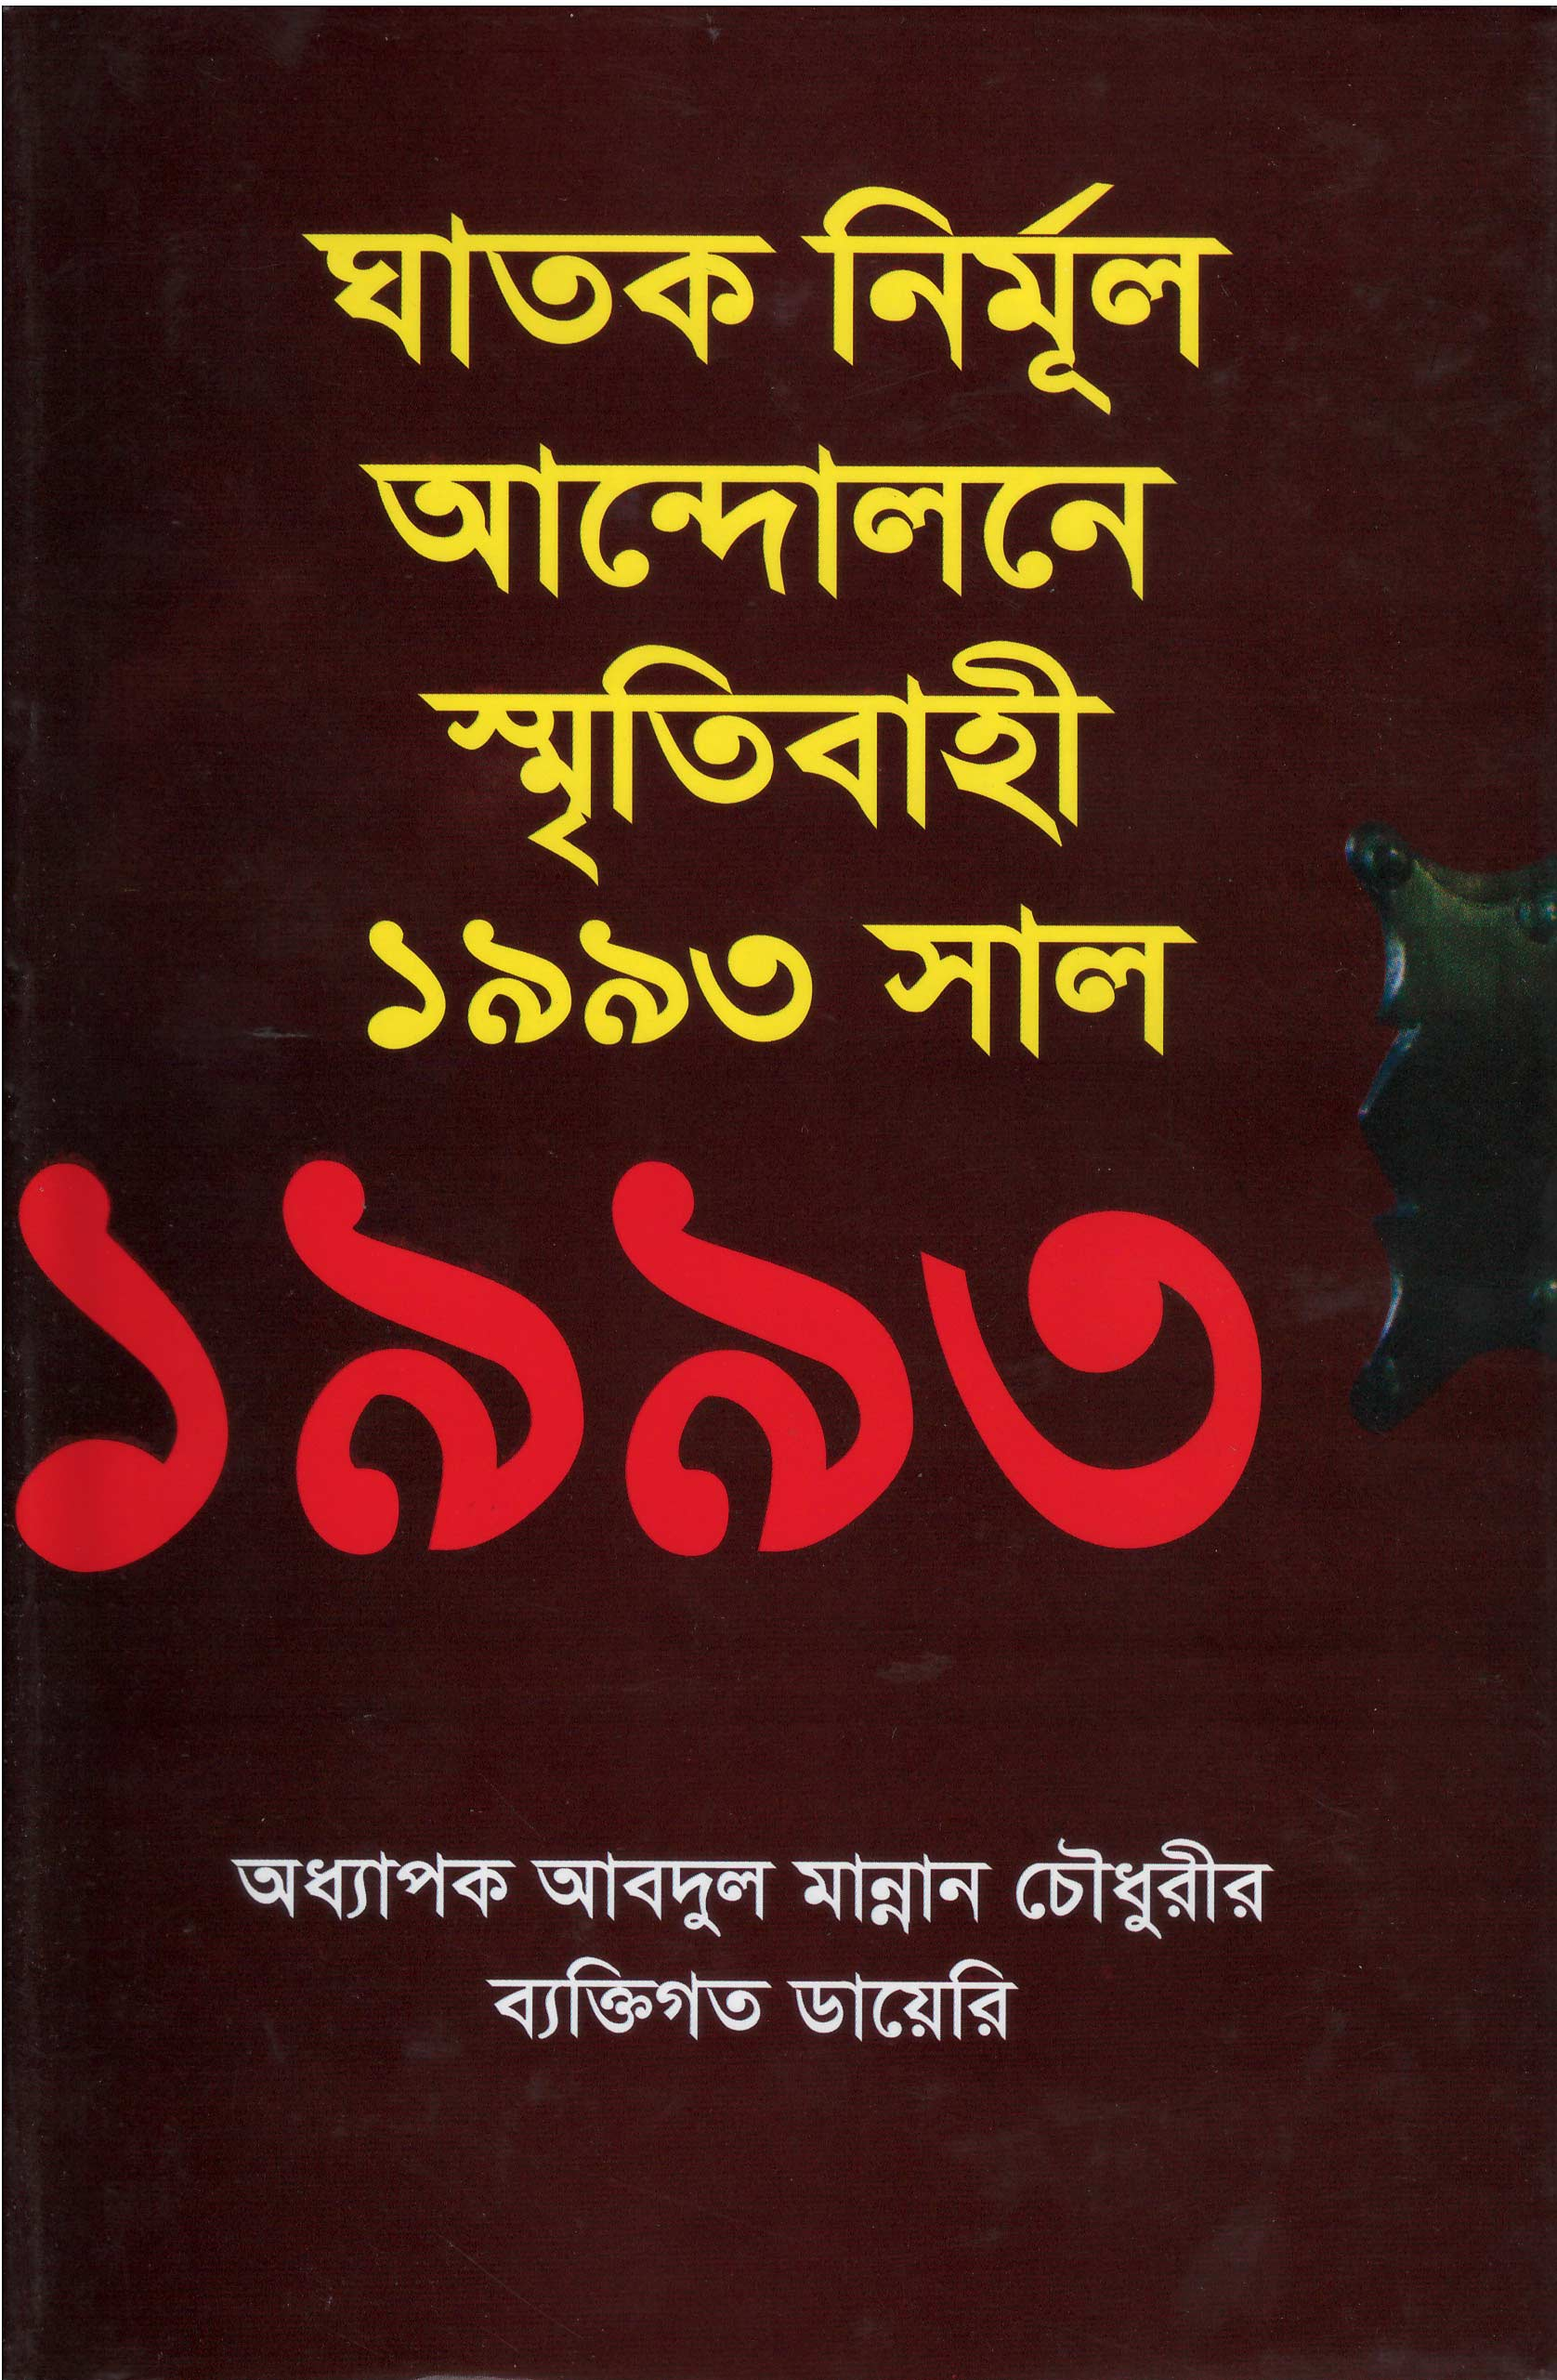 World University Vice Chancellor Book Ghatok Nirmul Andolon